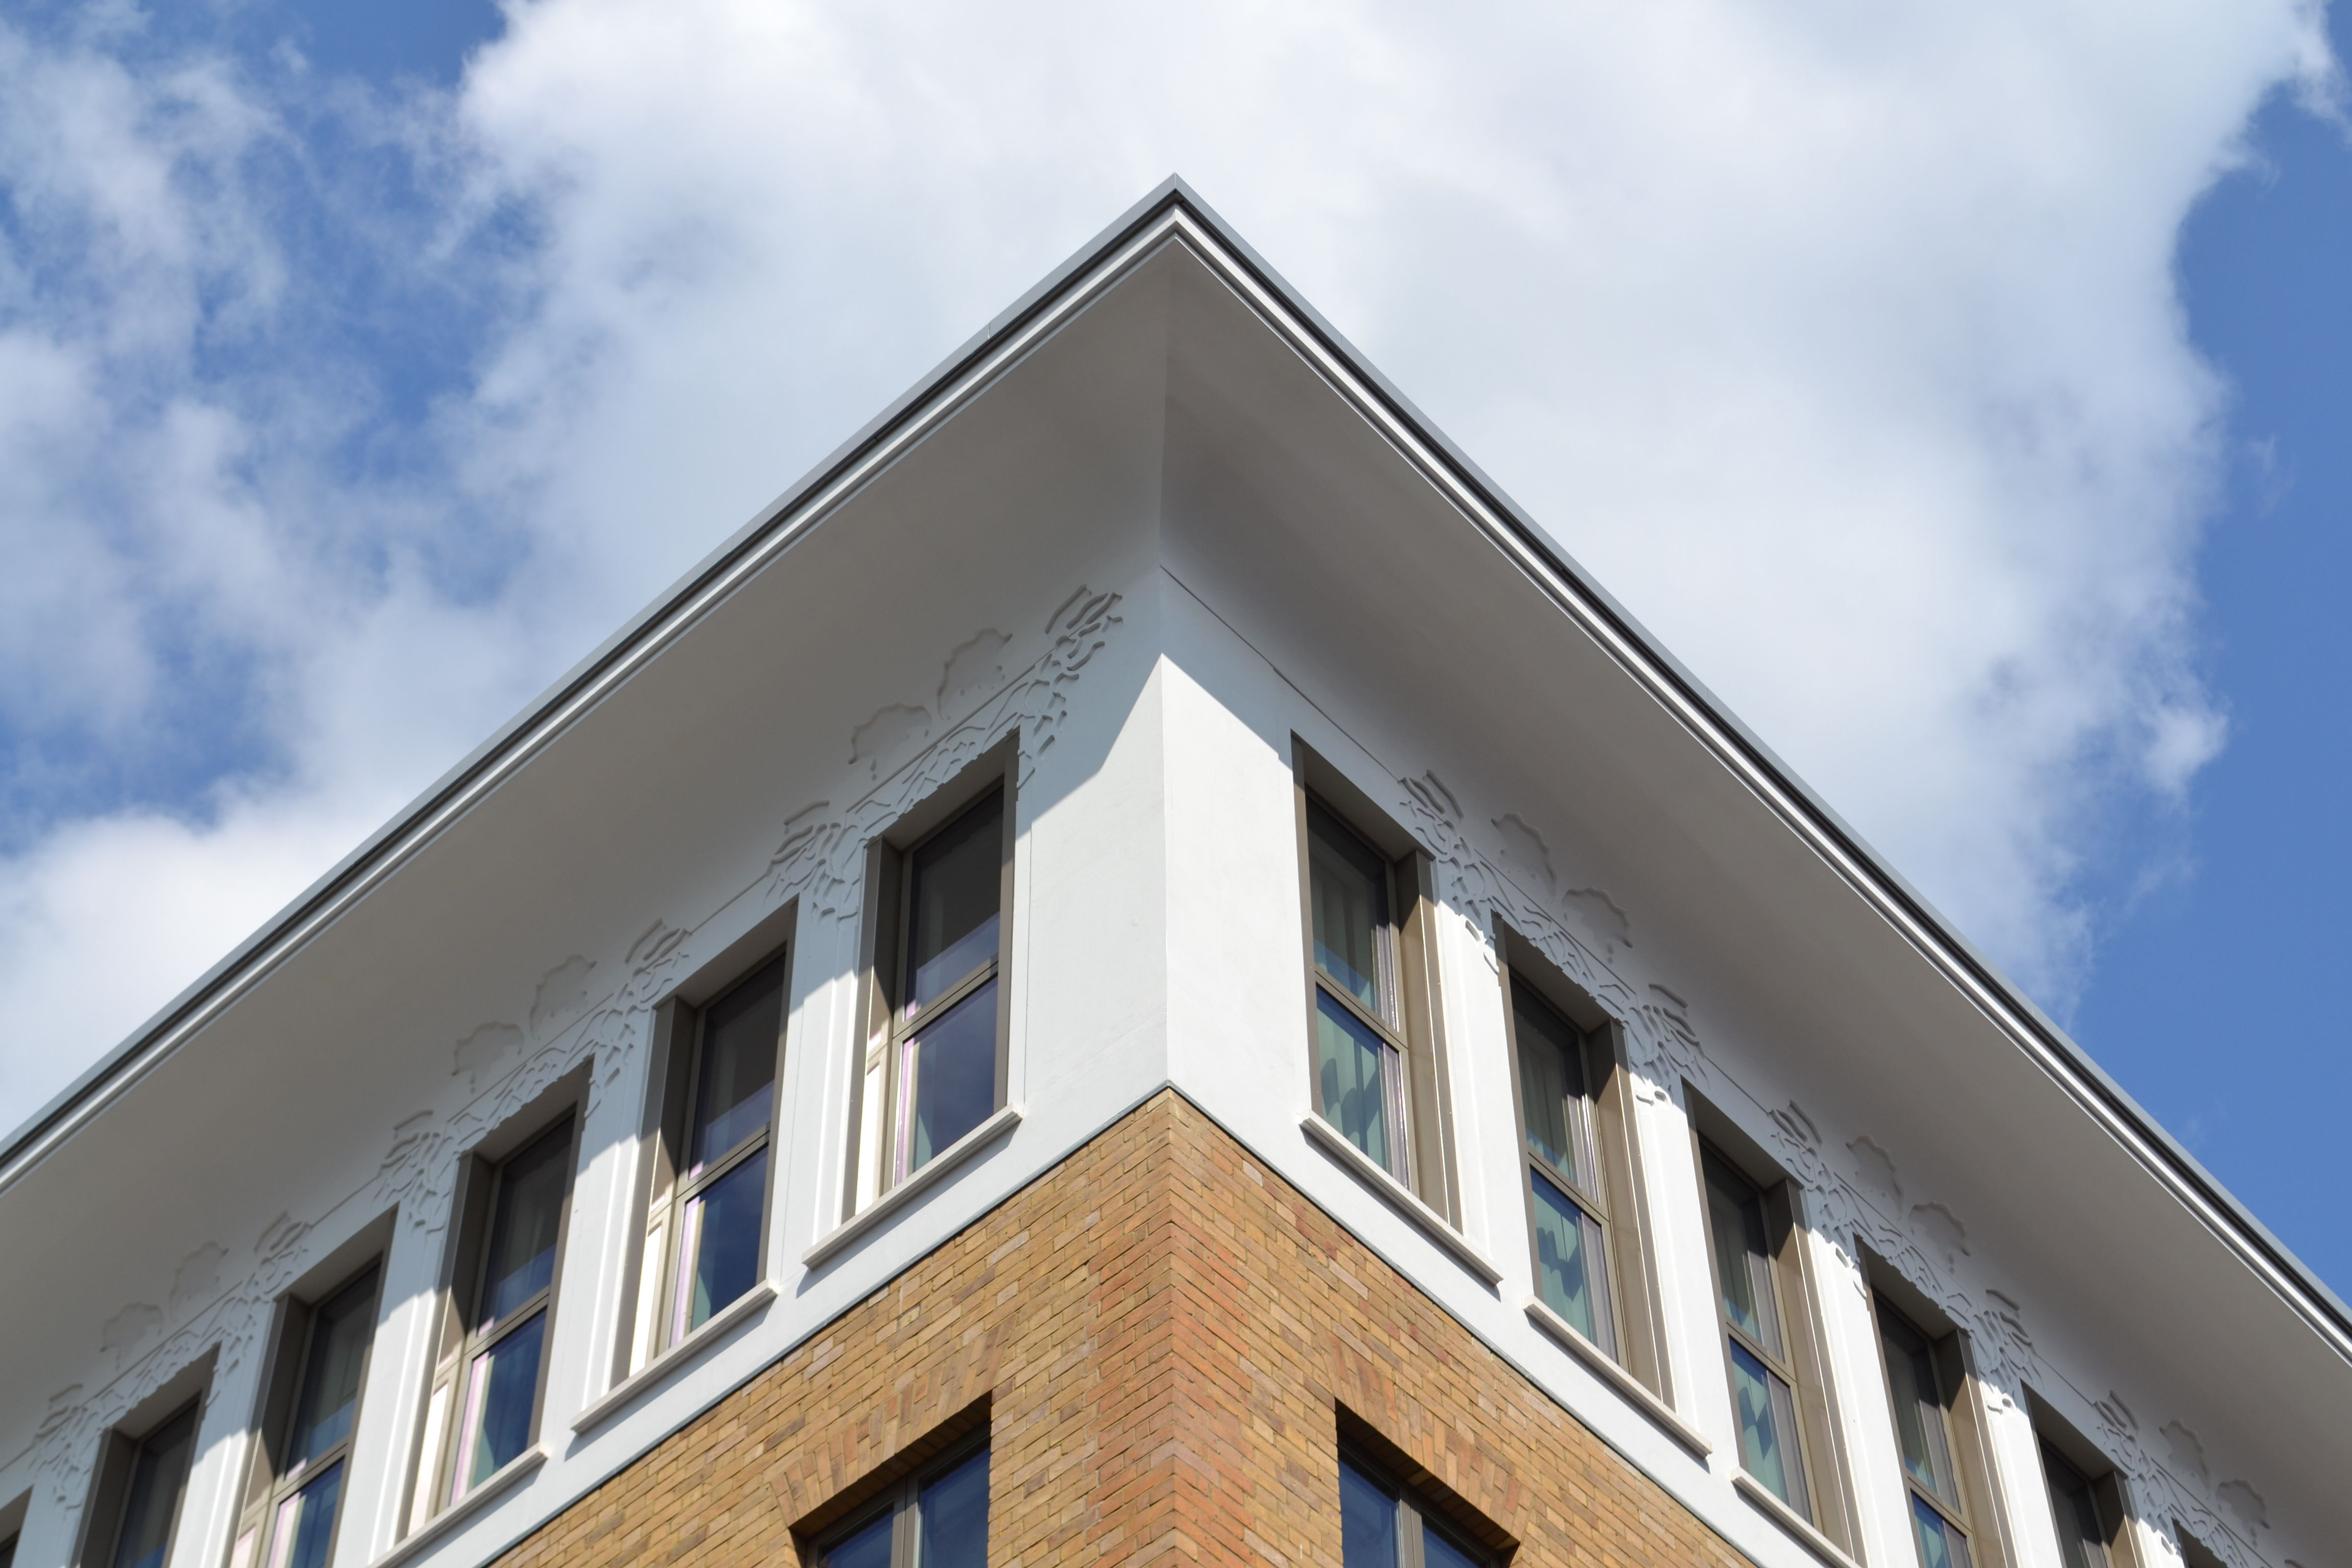 Hop House, Covent Garden - Roof Corner Detail including Hop Detail